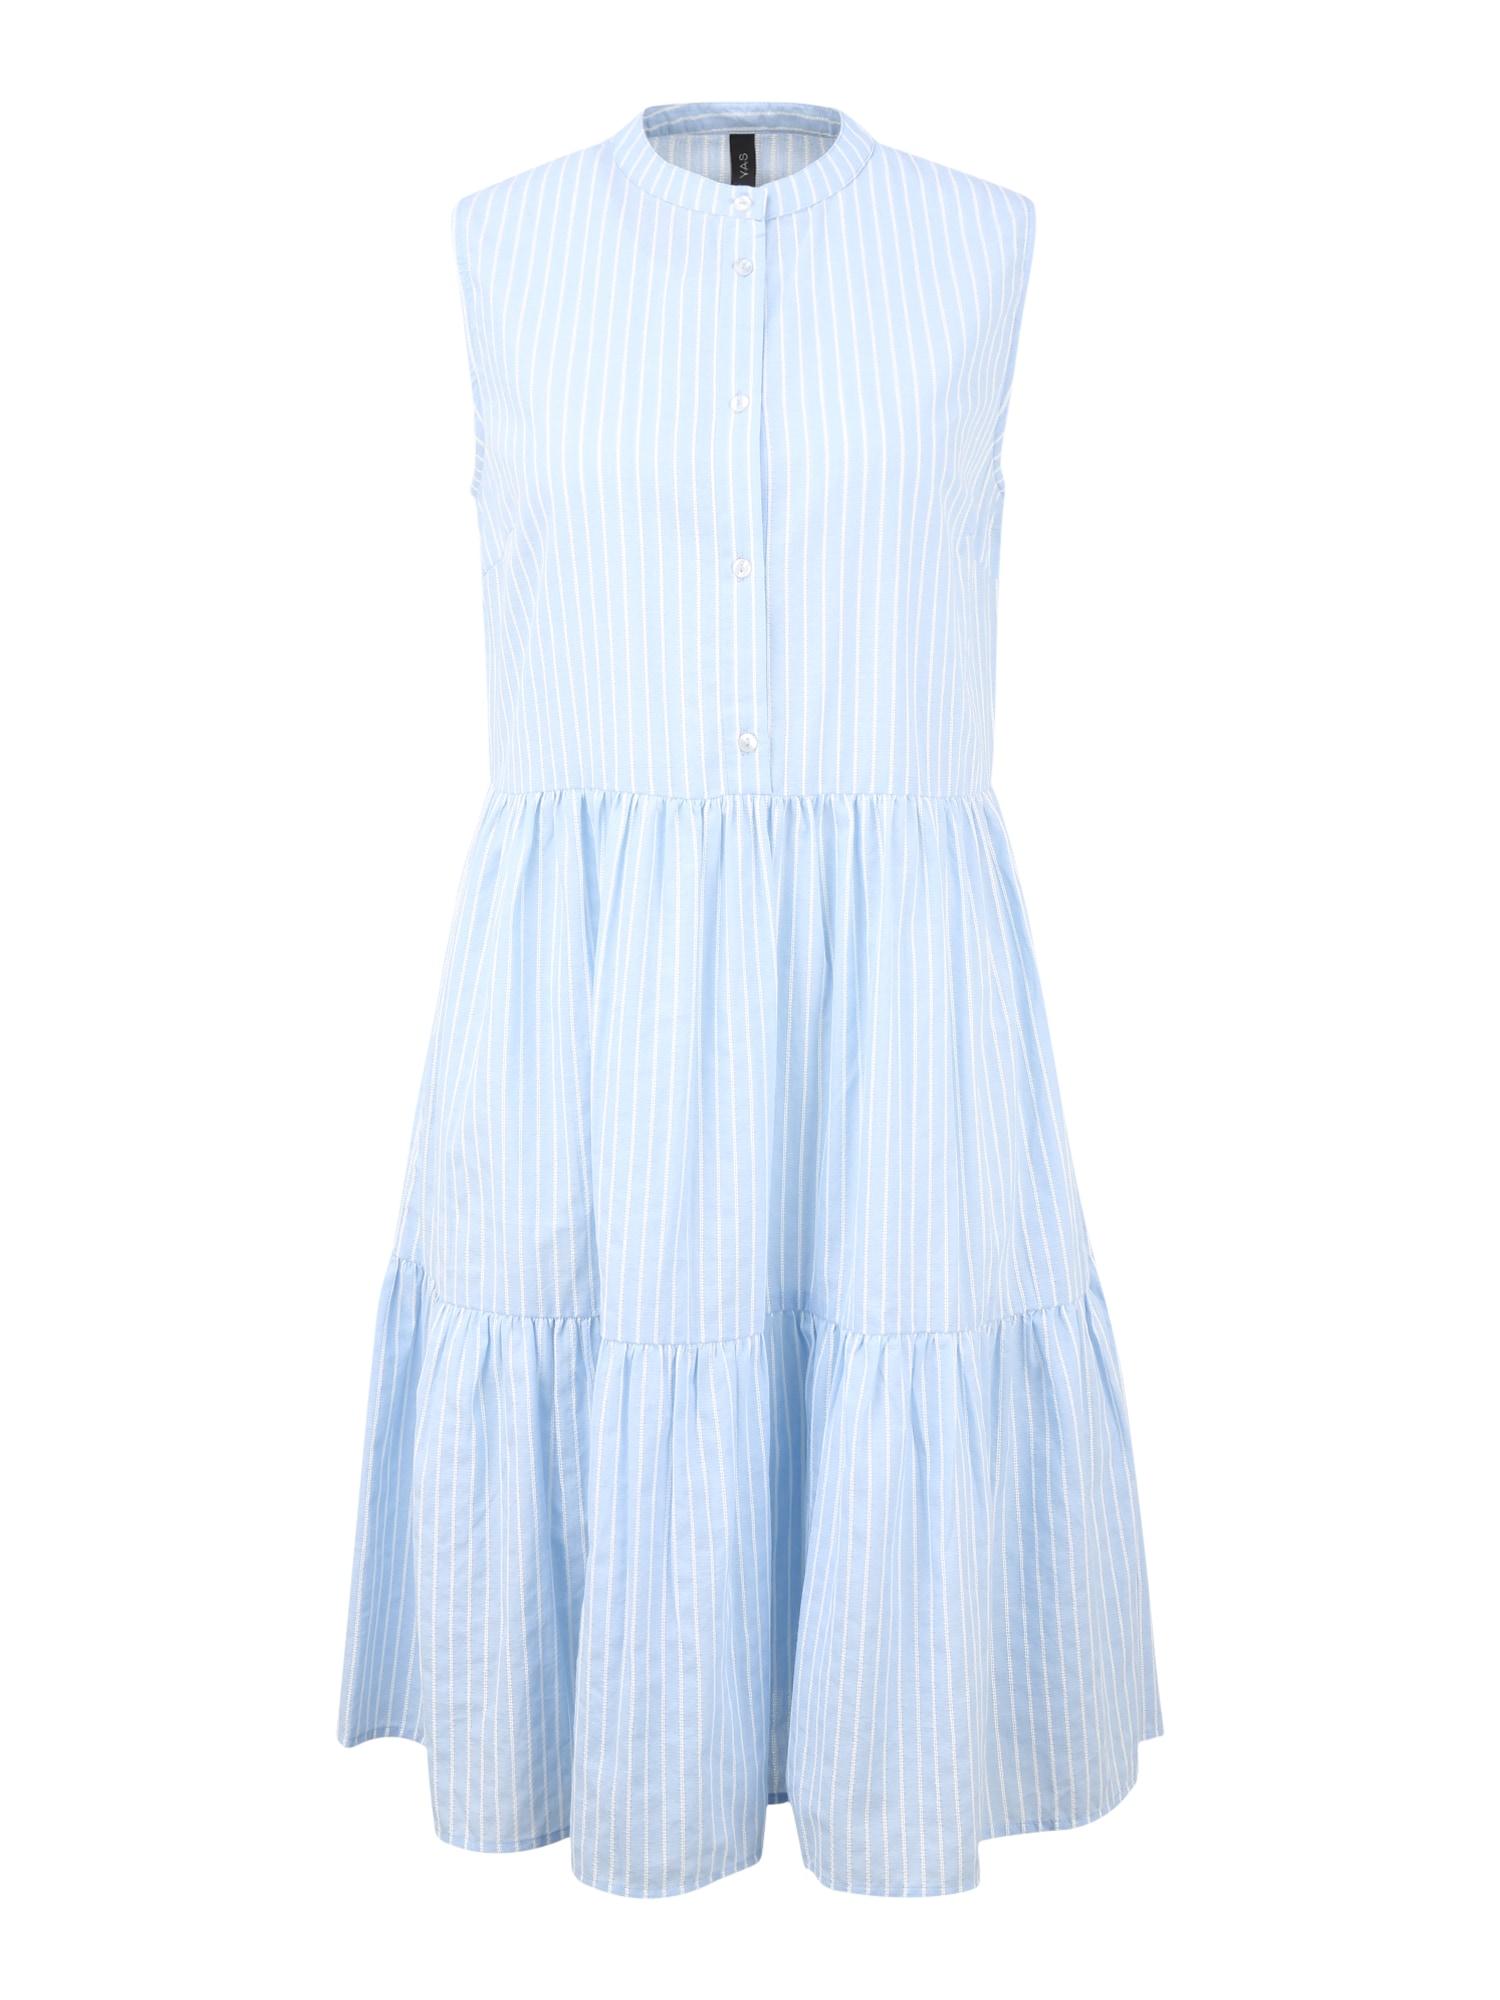 Y.A.S (Tall) Palaidinės tipo suknelė mėlyna dūmų spalva / balta